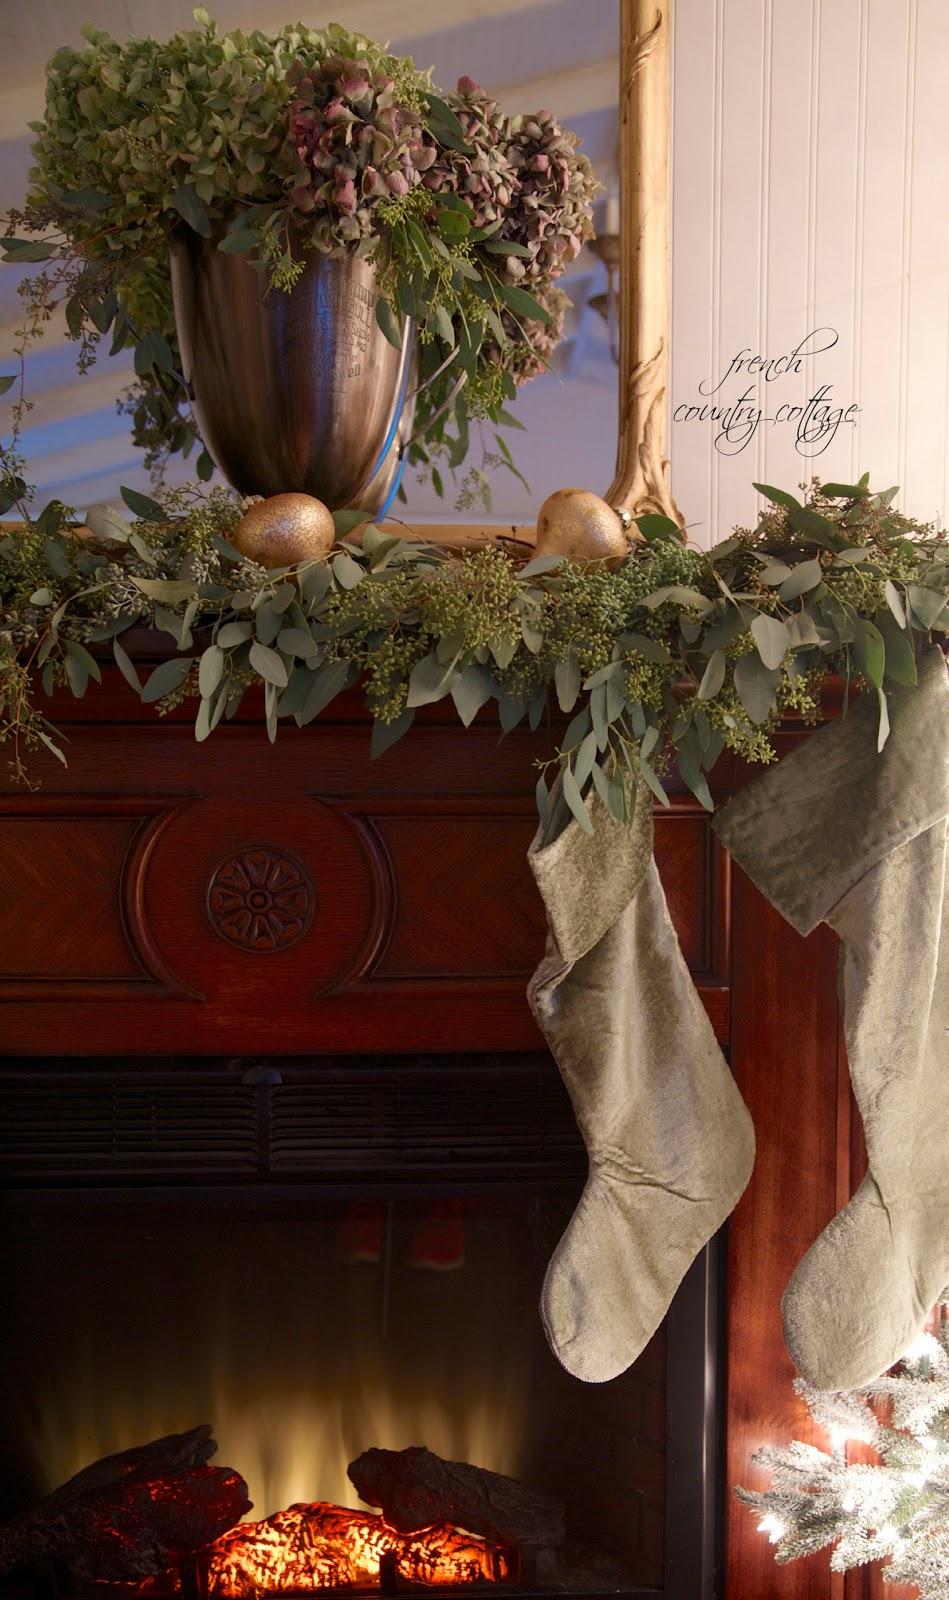 Country christmas mantel decor - Christmas Mantel French Hydrangeas Eucalyptus